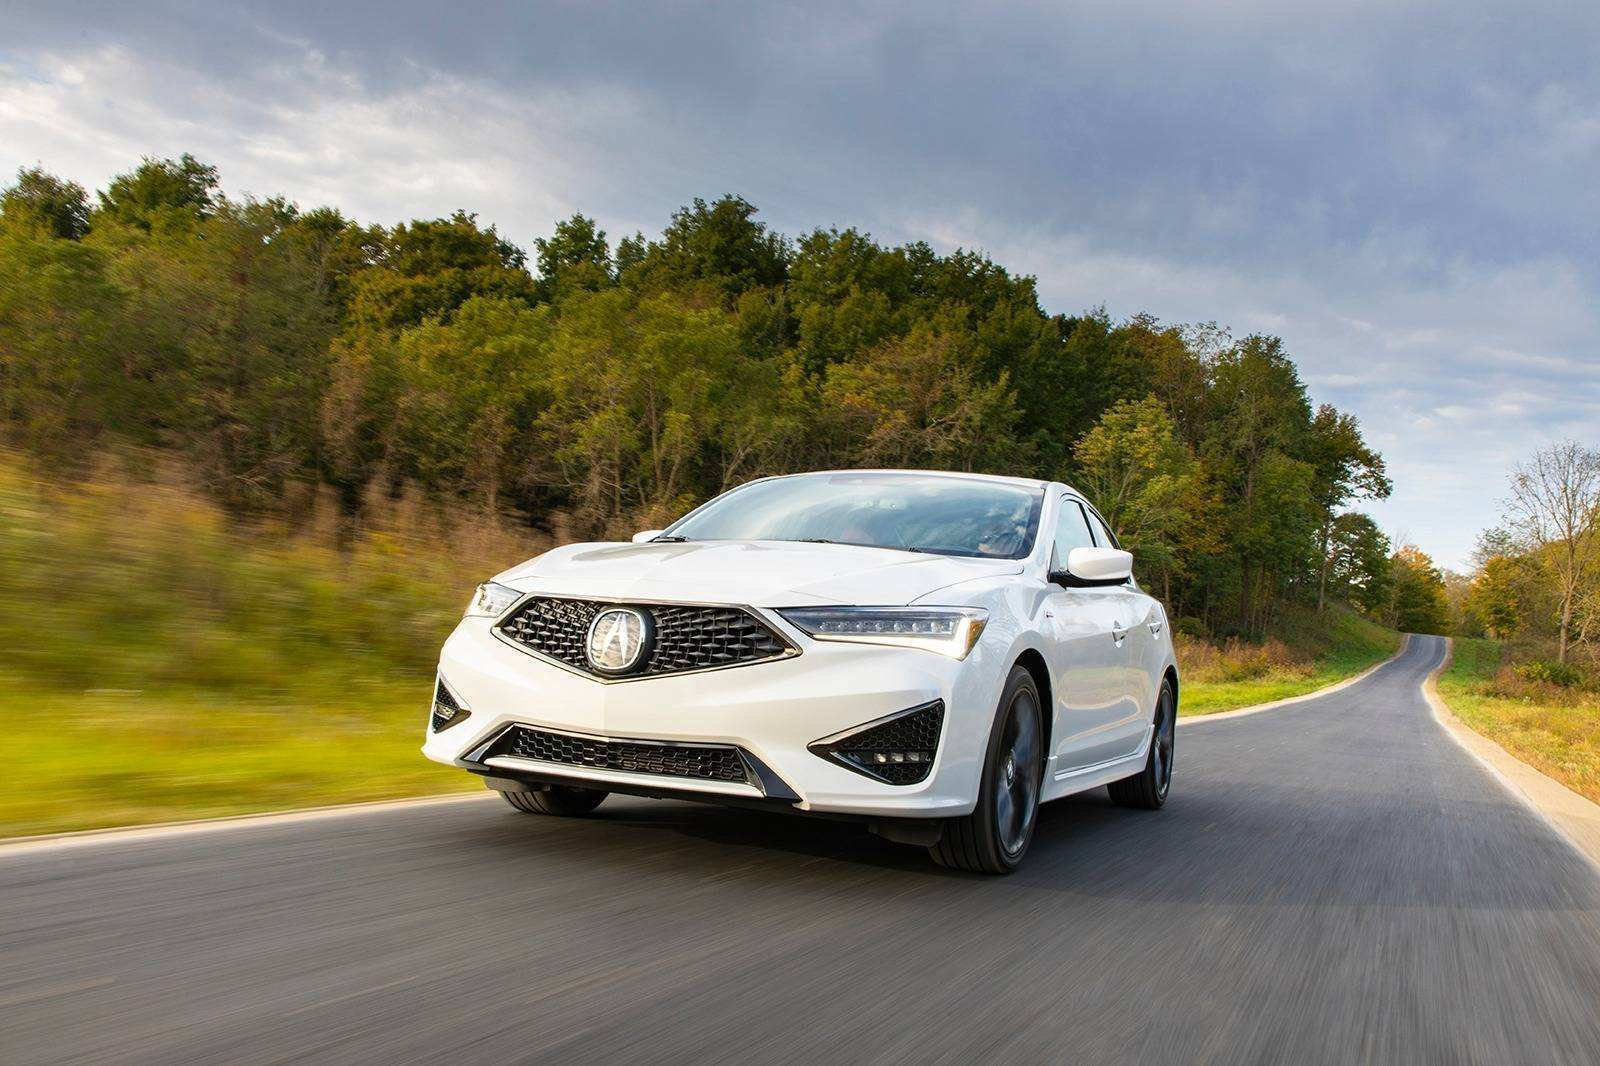 84 Concept of Acura Hatchback 2019 Interior for Acura Hatchback 2019